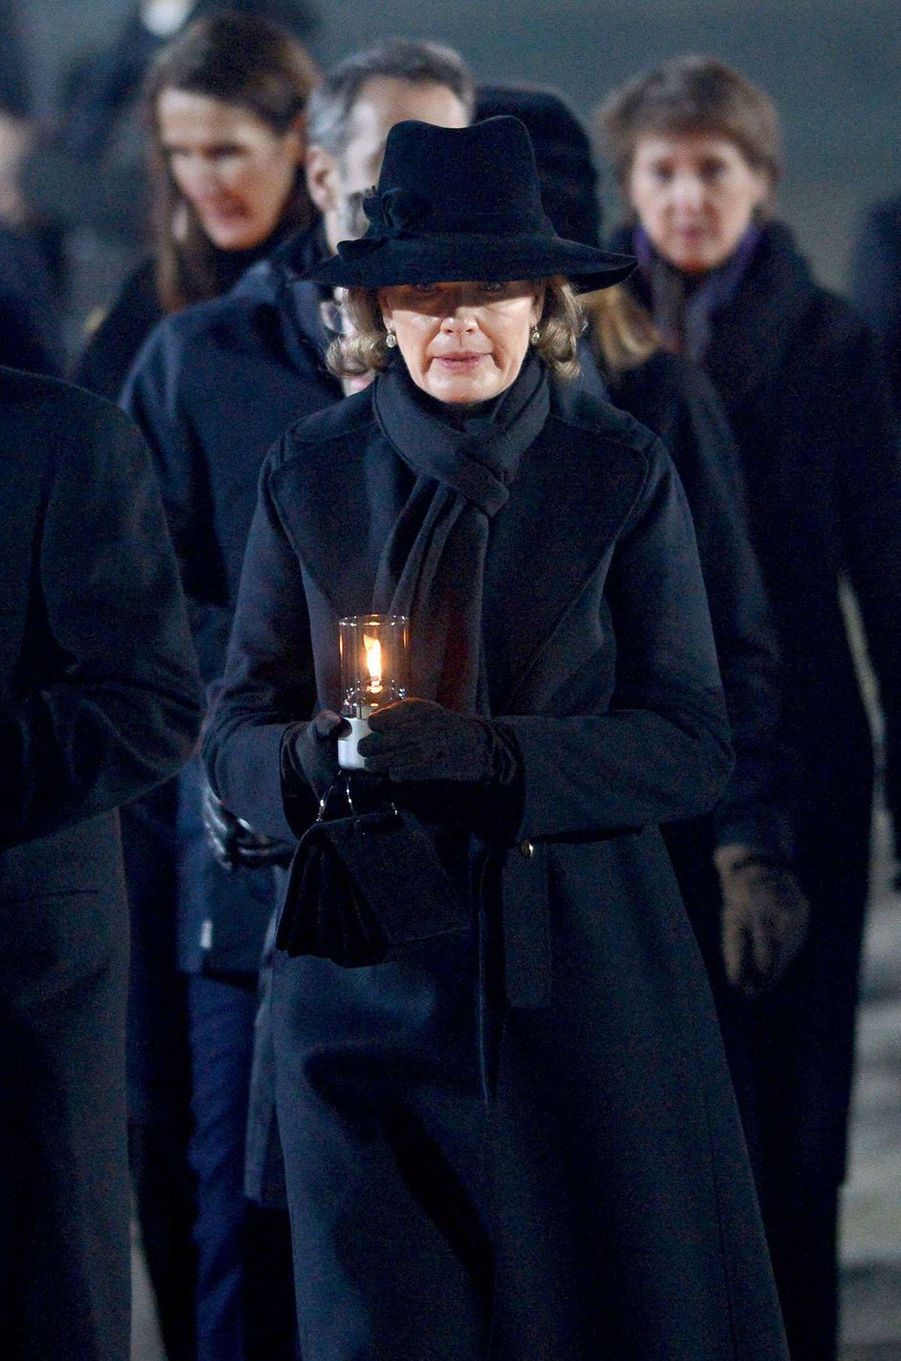 La reine des Belges Mathilde à Auschwitz-Birkenau, le 27 janvier 2020